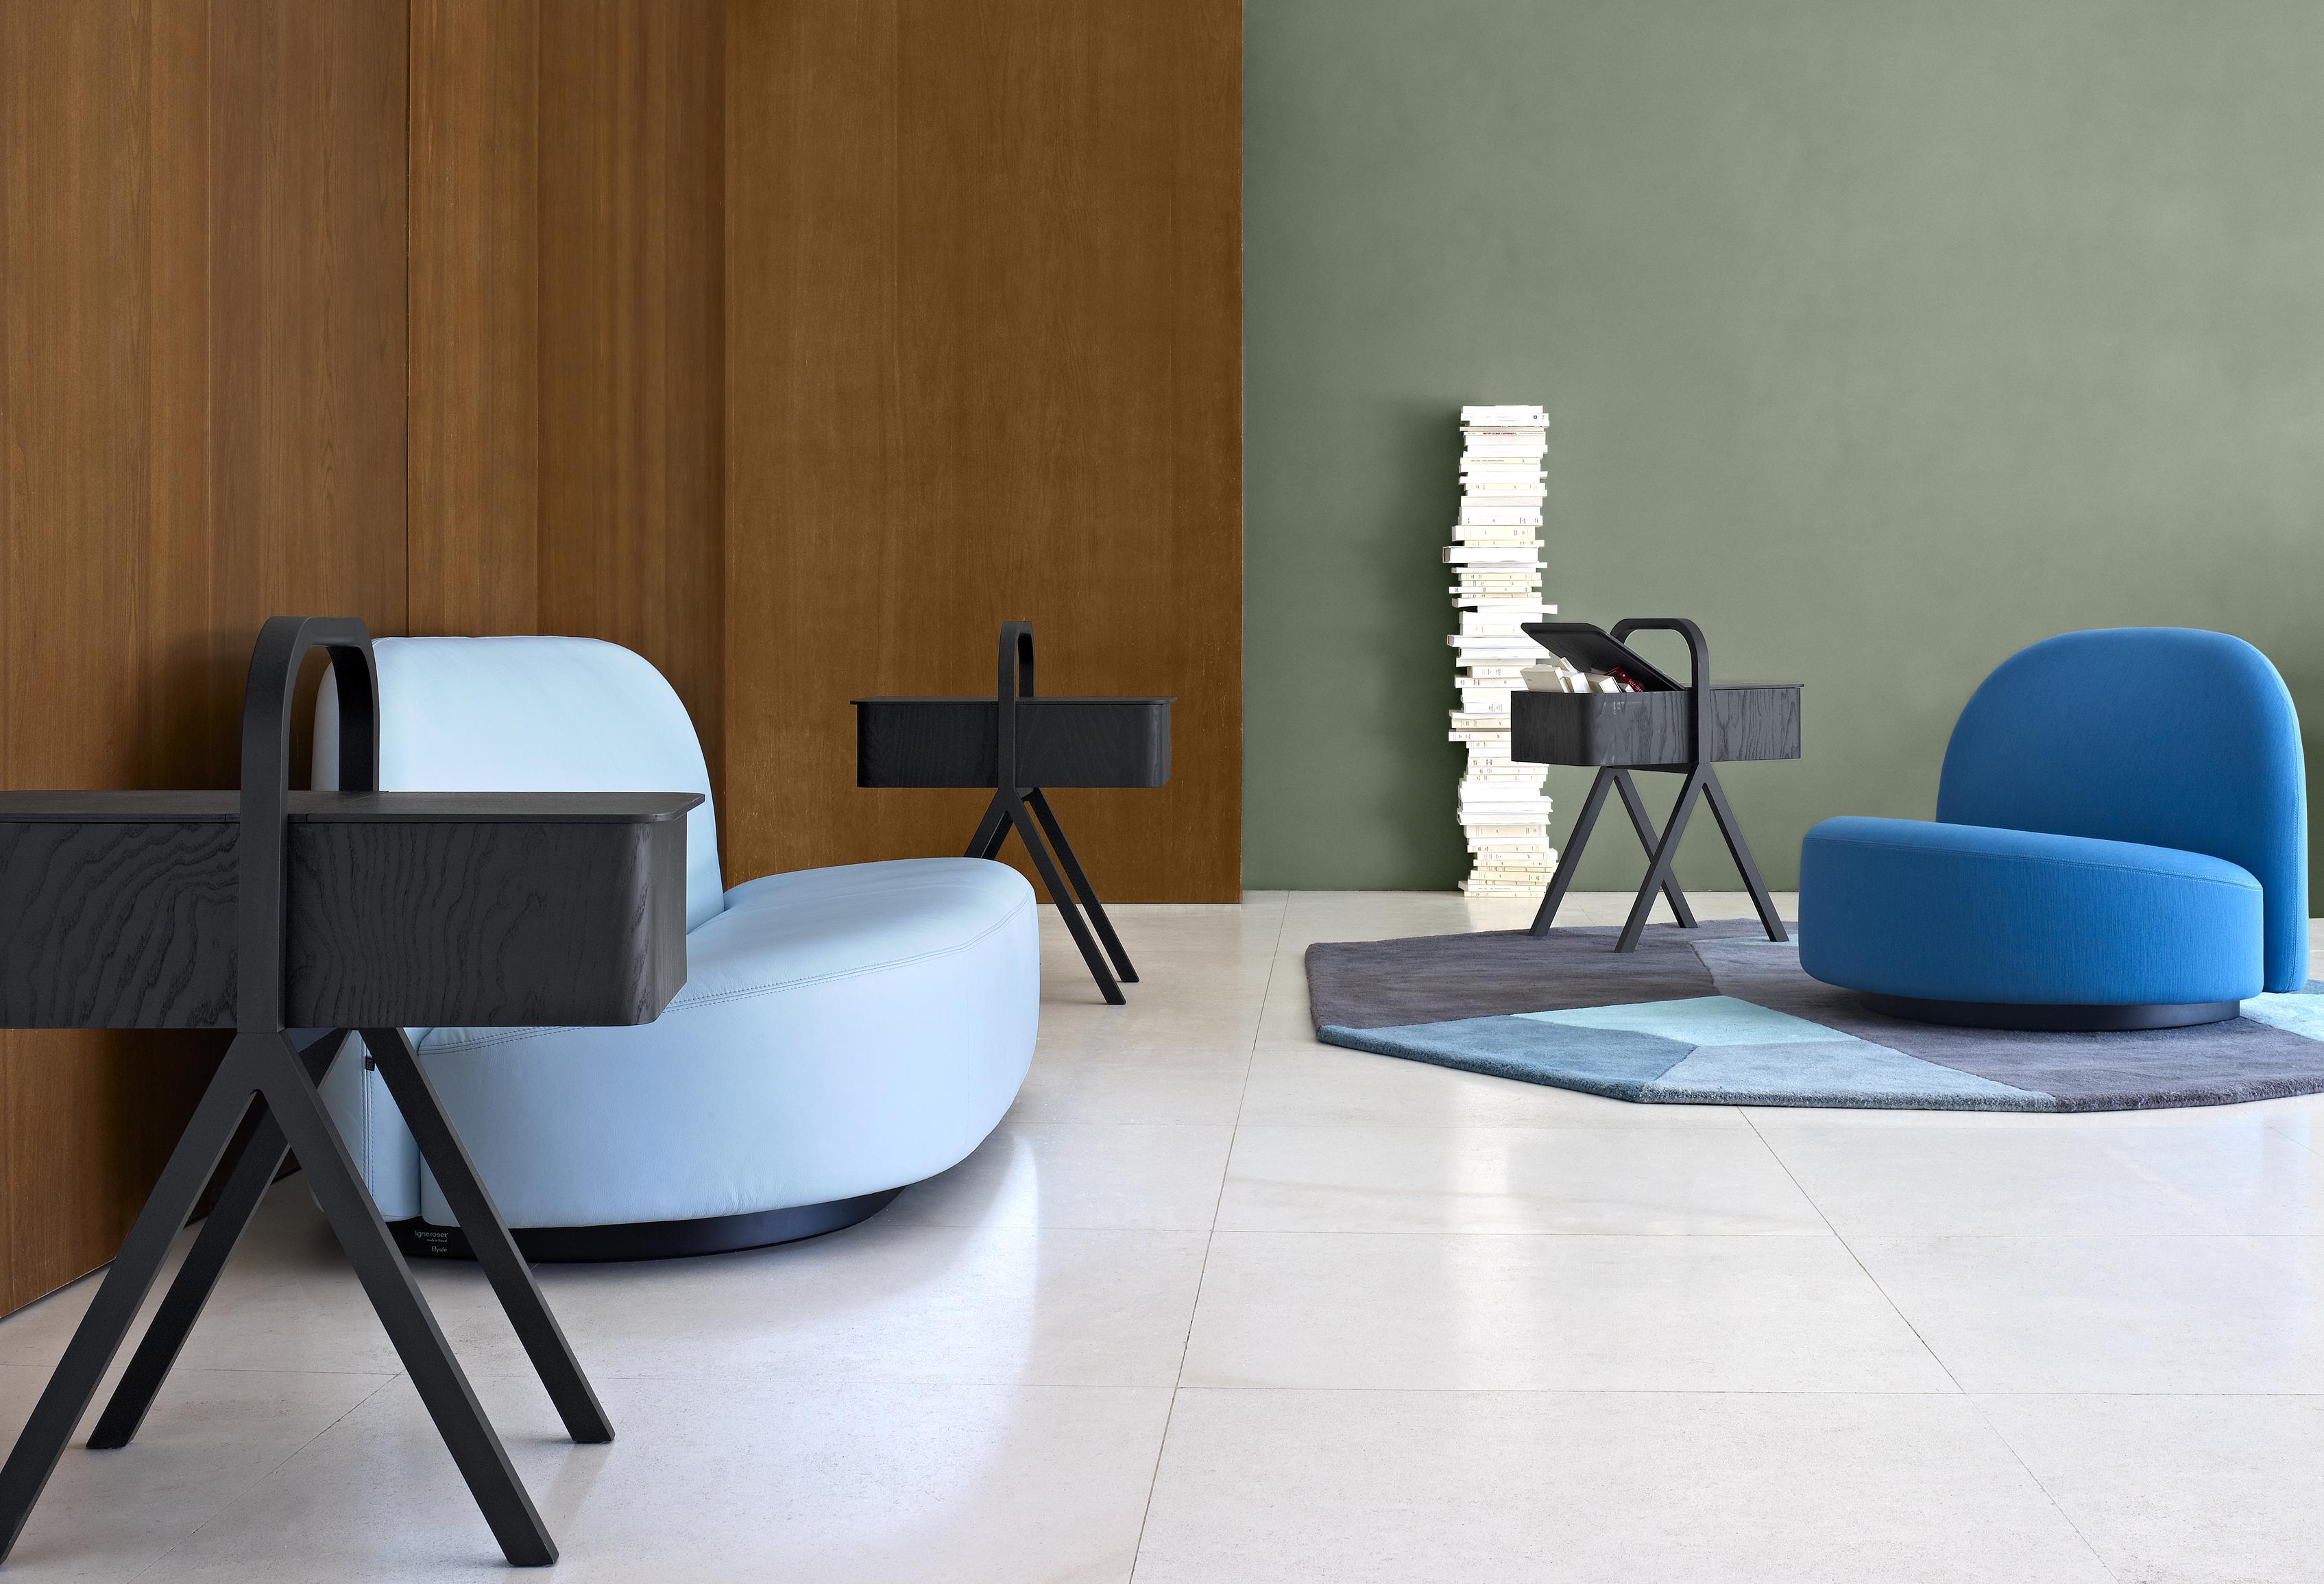 elysee upholstery from designer pierre paulin ligne roset official site. Black Bedroom Furniture Sets. Home Design Ideas